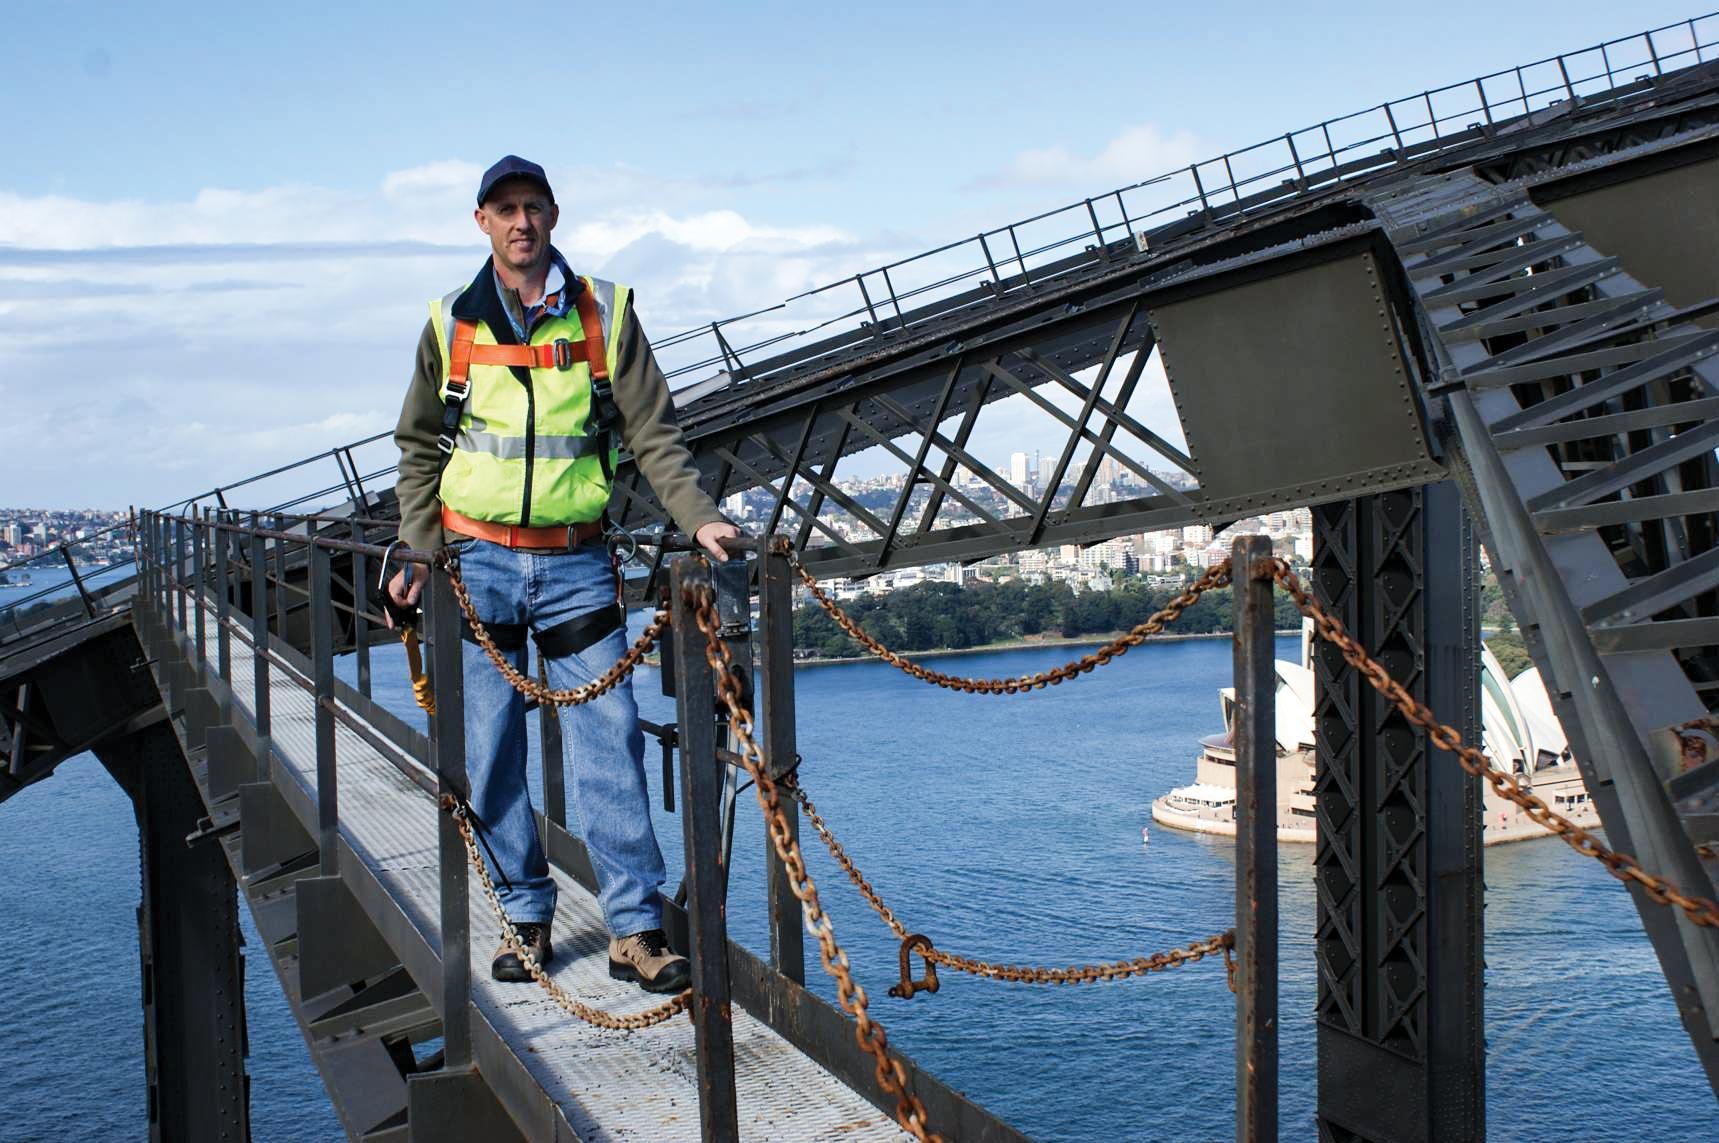 Civil engineer Peter Mann at work on the Sydney Harbour Bridge.